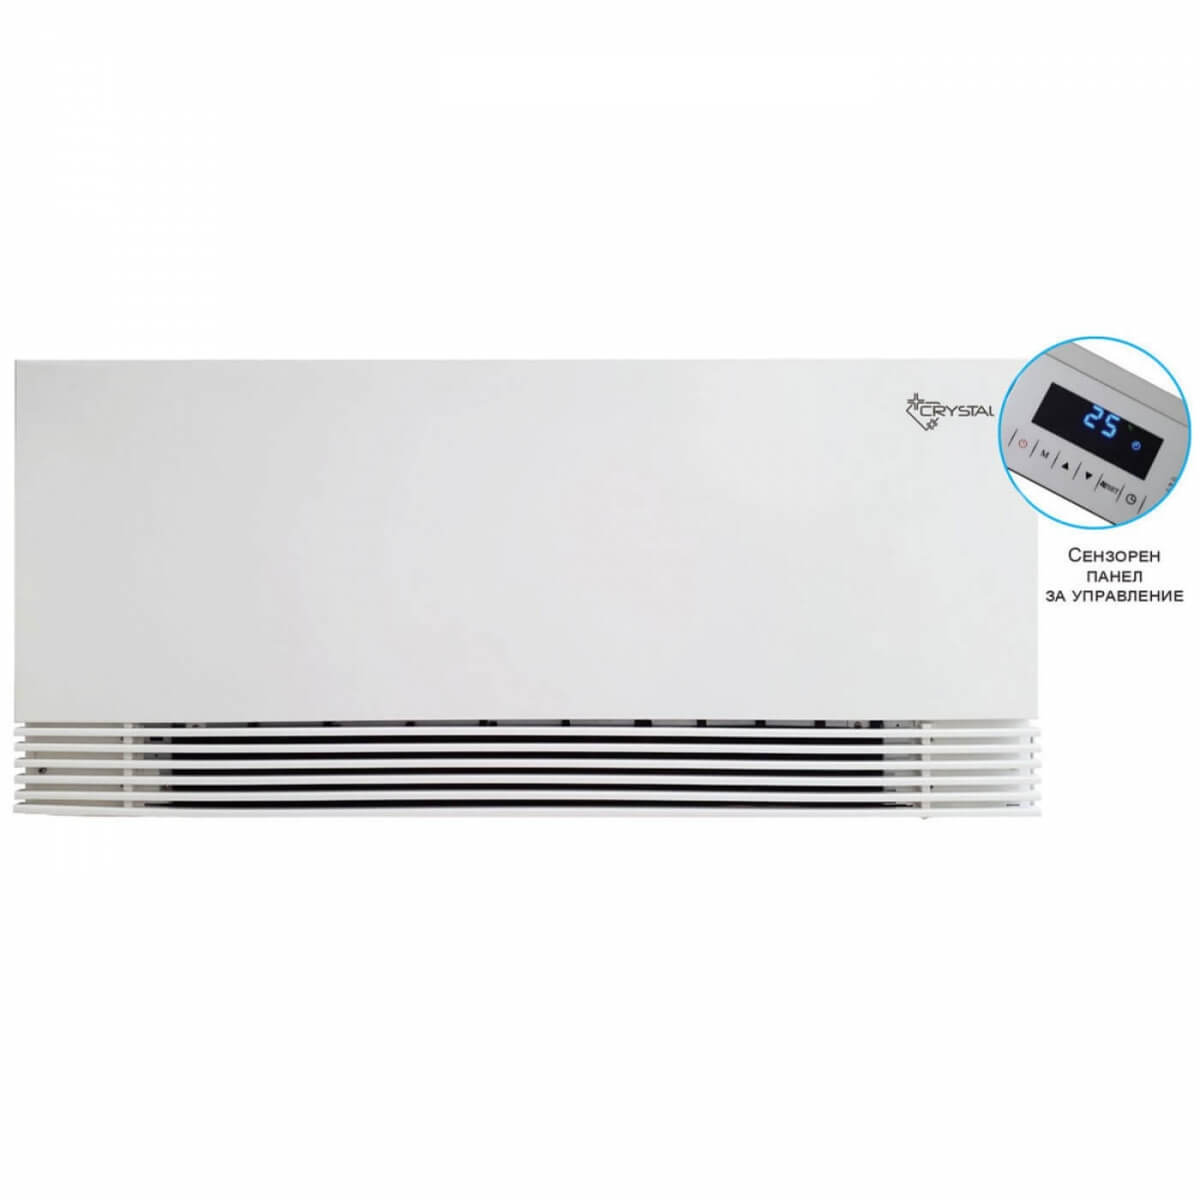 Вентилаторен конвектор Crystal BGR-600 L/R - 1